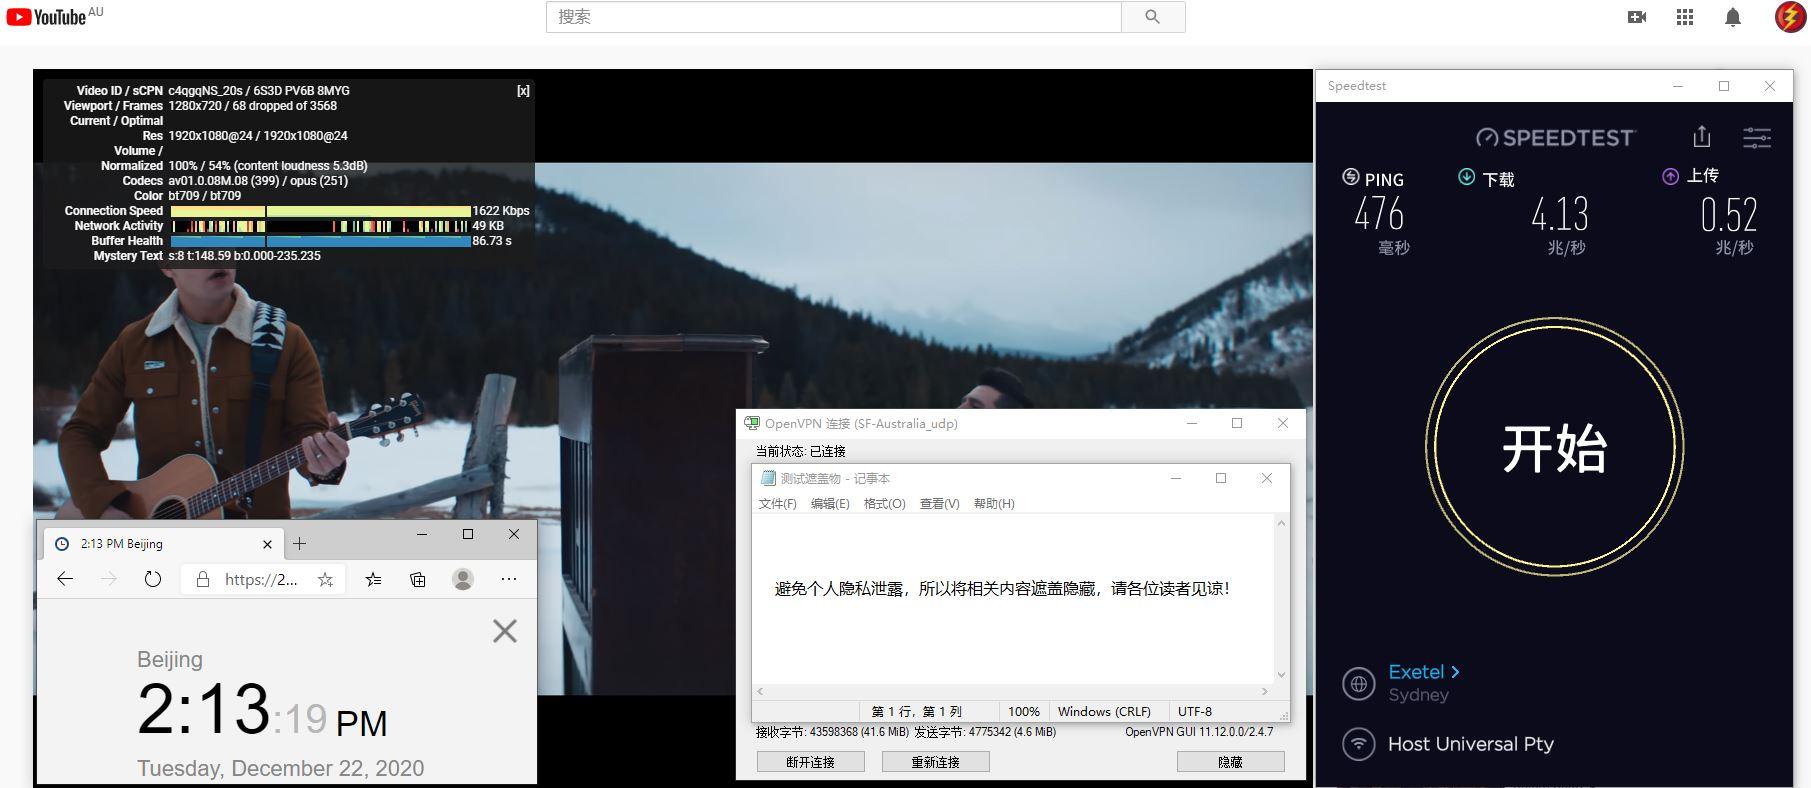 Windows10 SurfsharkVPN Australia 服务器 中国VPN 翻墙 科学上网 测试 - 20201222